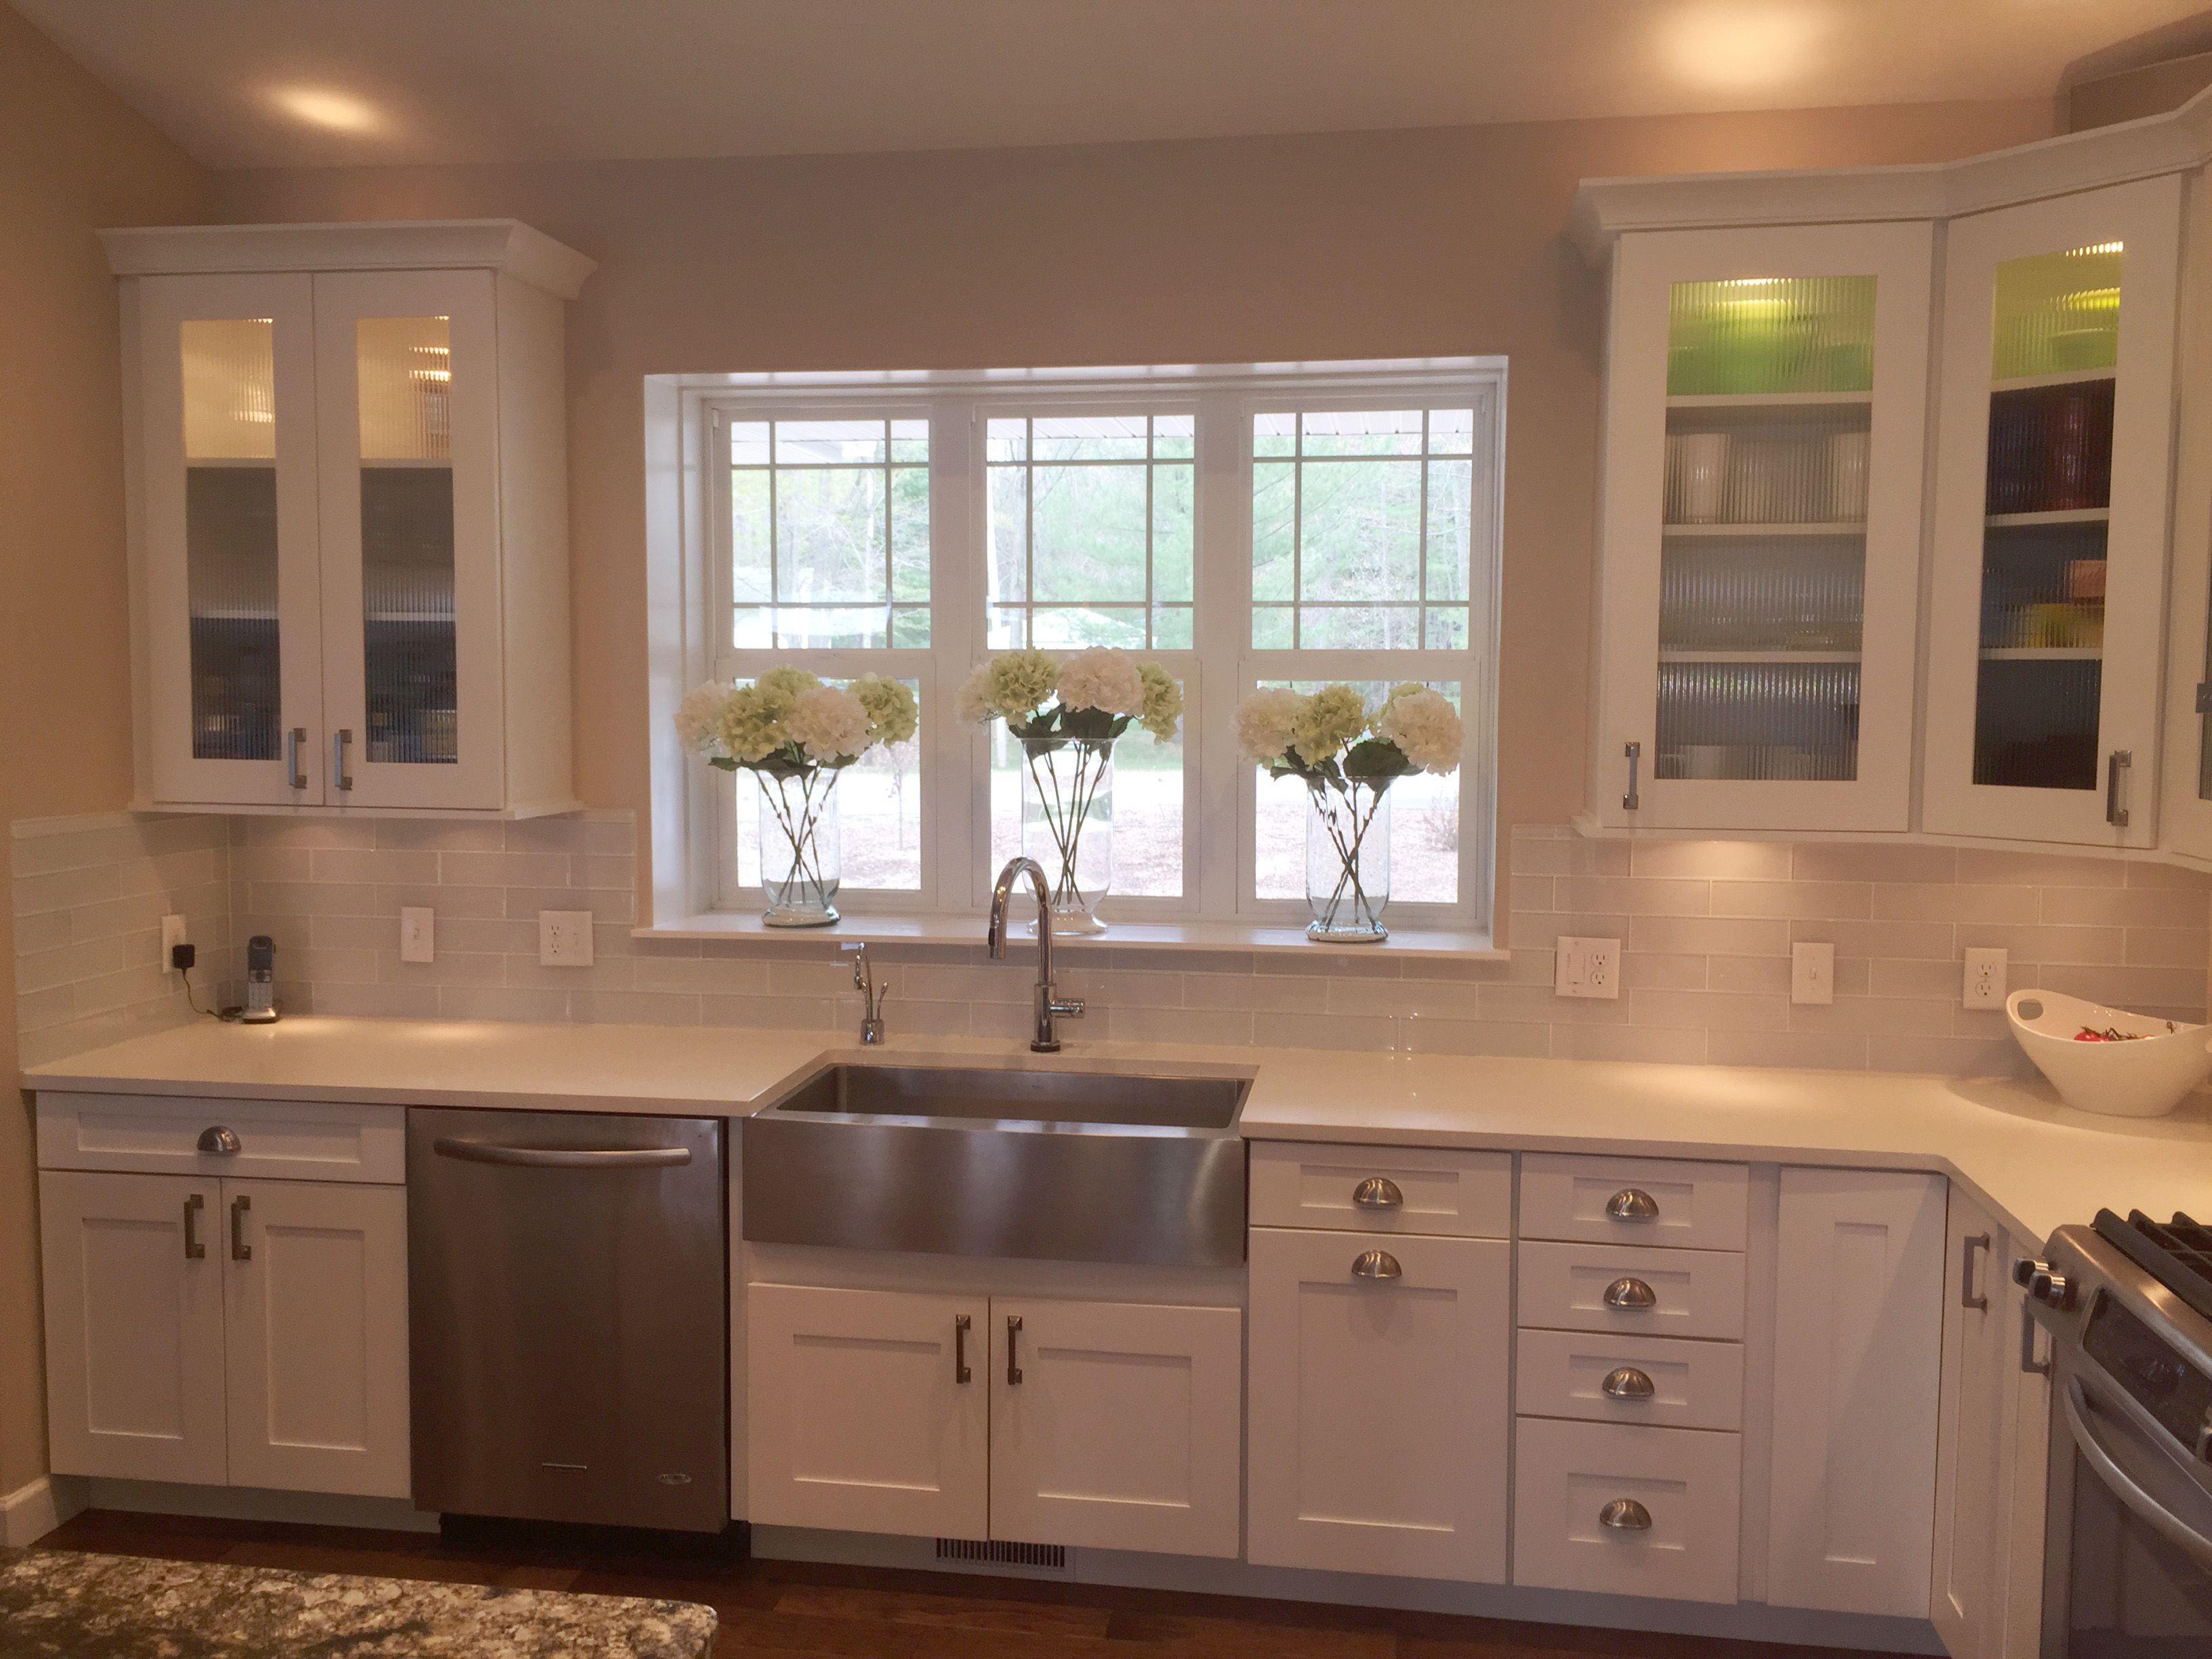 White shaker style kitchen with Hickory Hardware